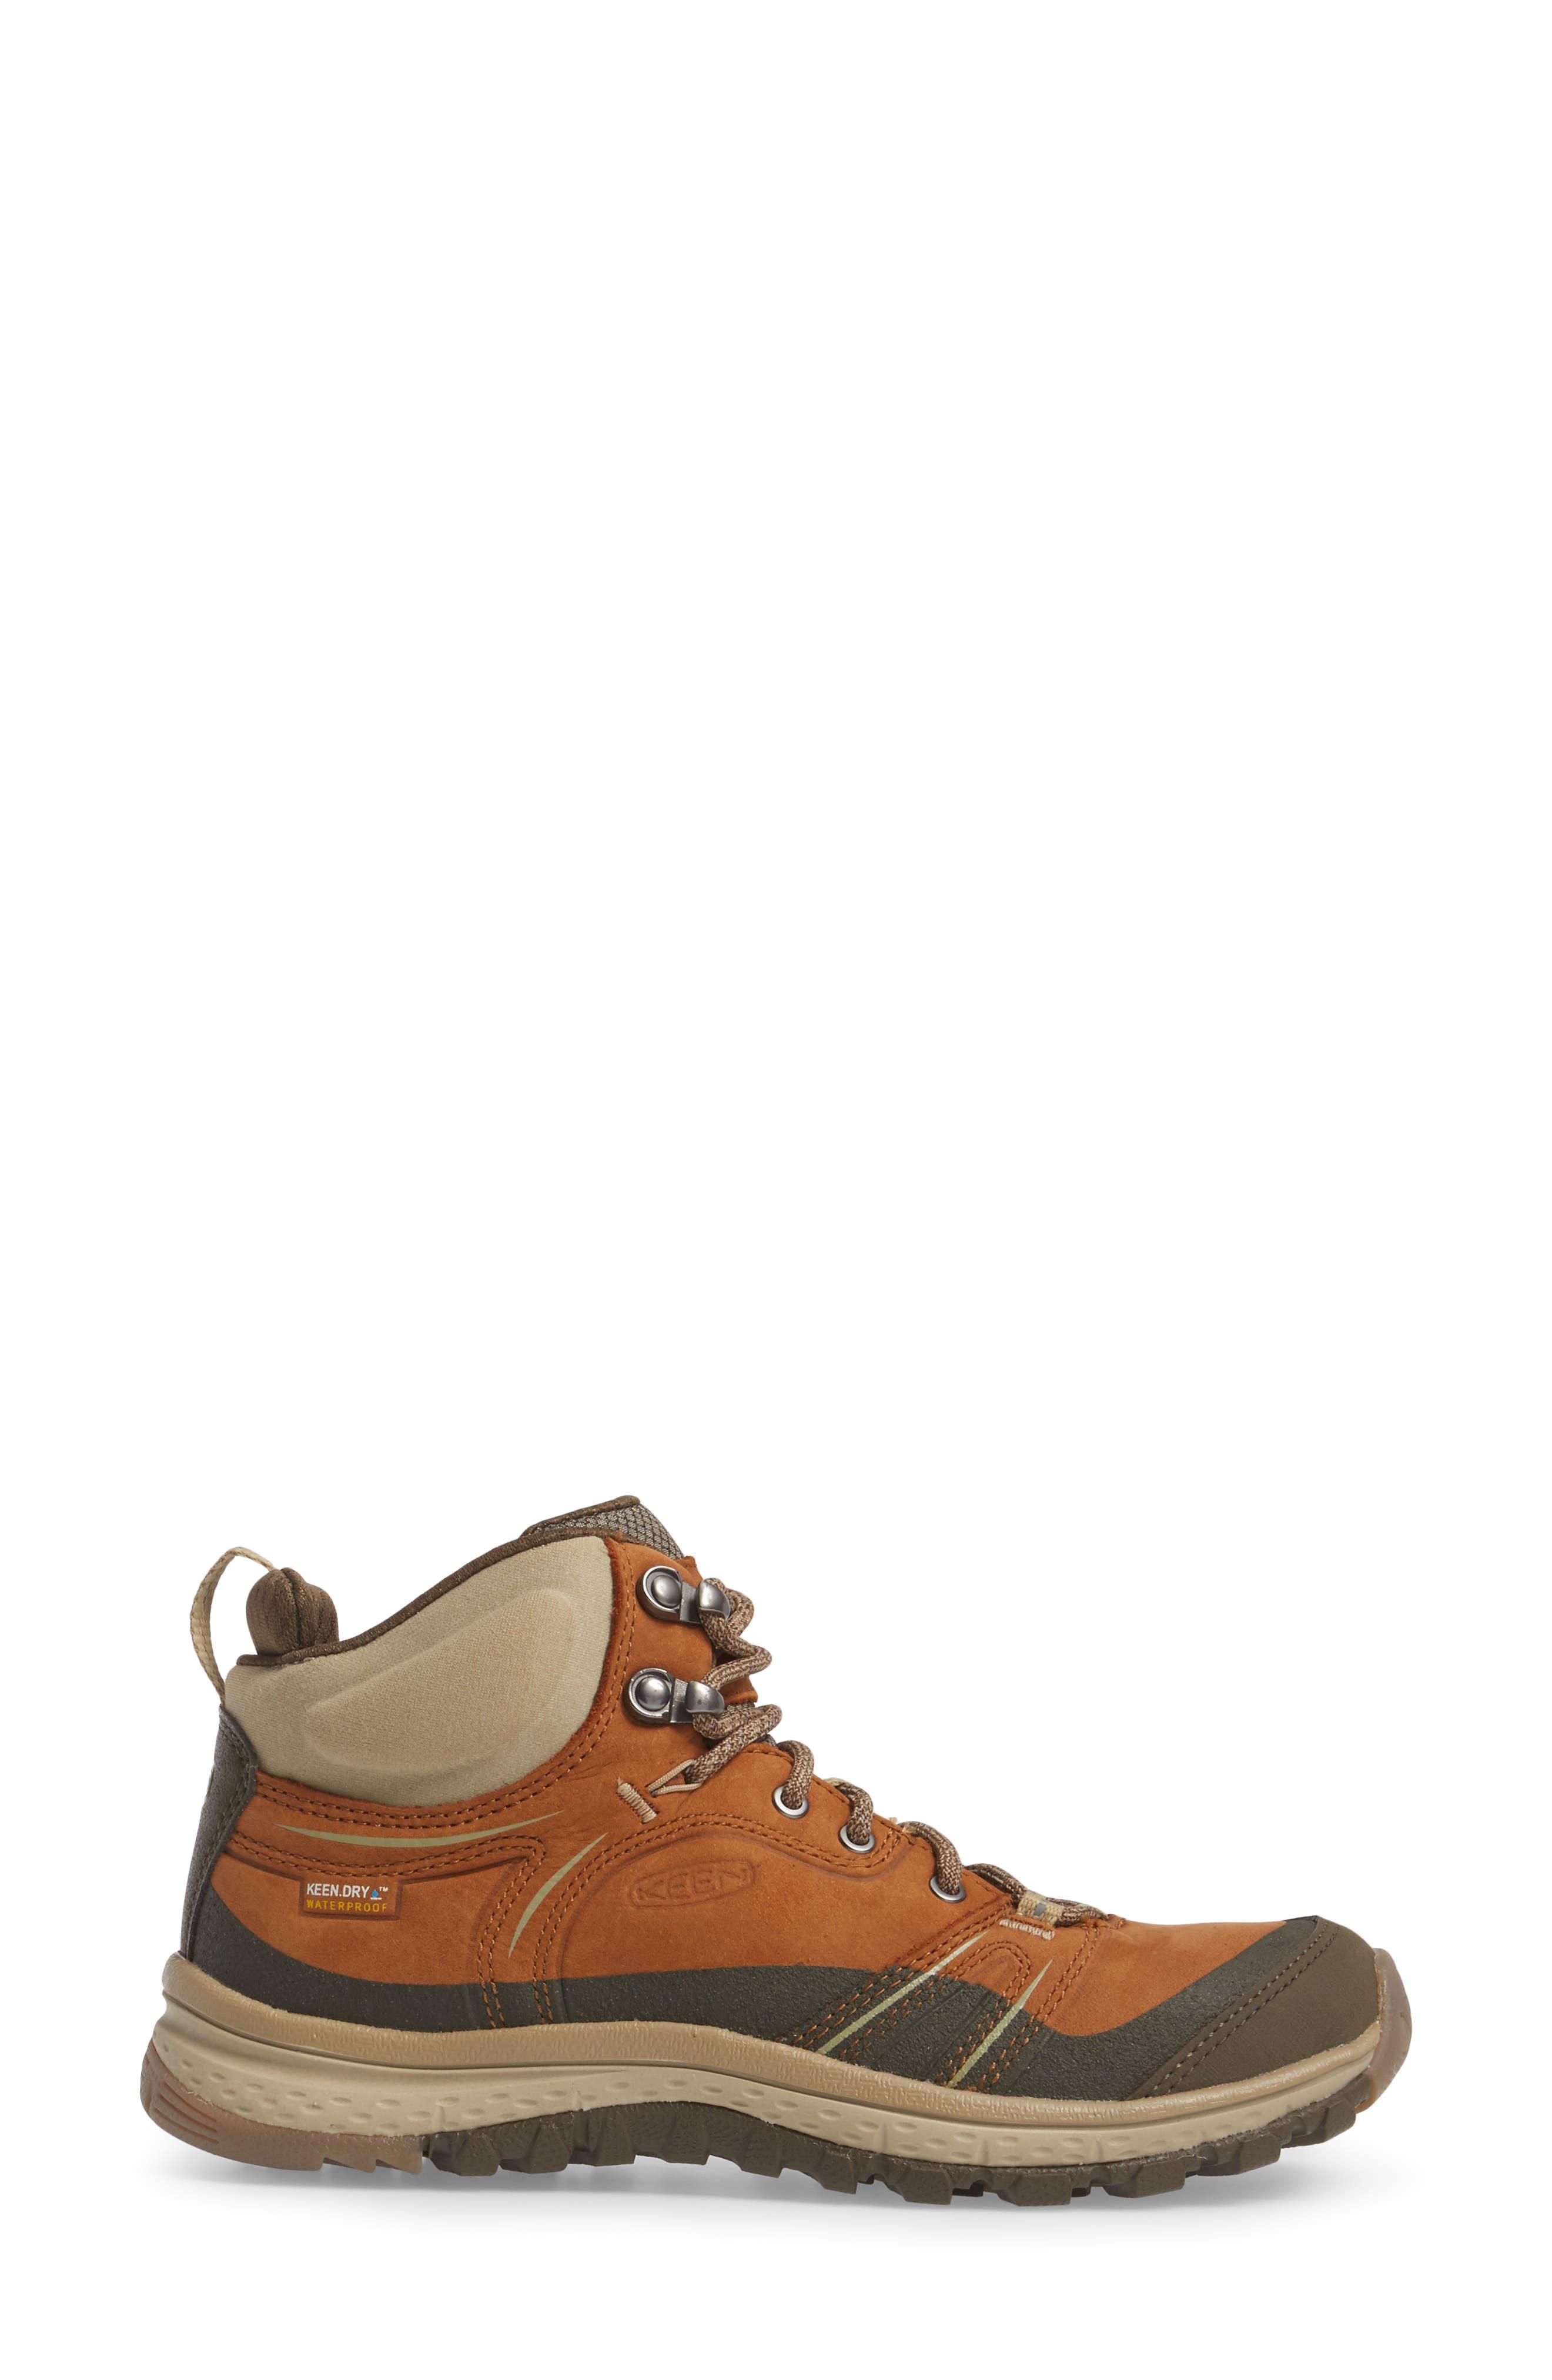 KEEN, Terradora Leather Waterproof Hiking Boot, Alternate thumbnail 3, color, TIMBER/ ORANGE NUBUCK